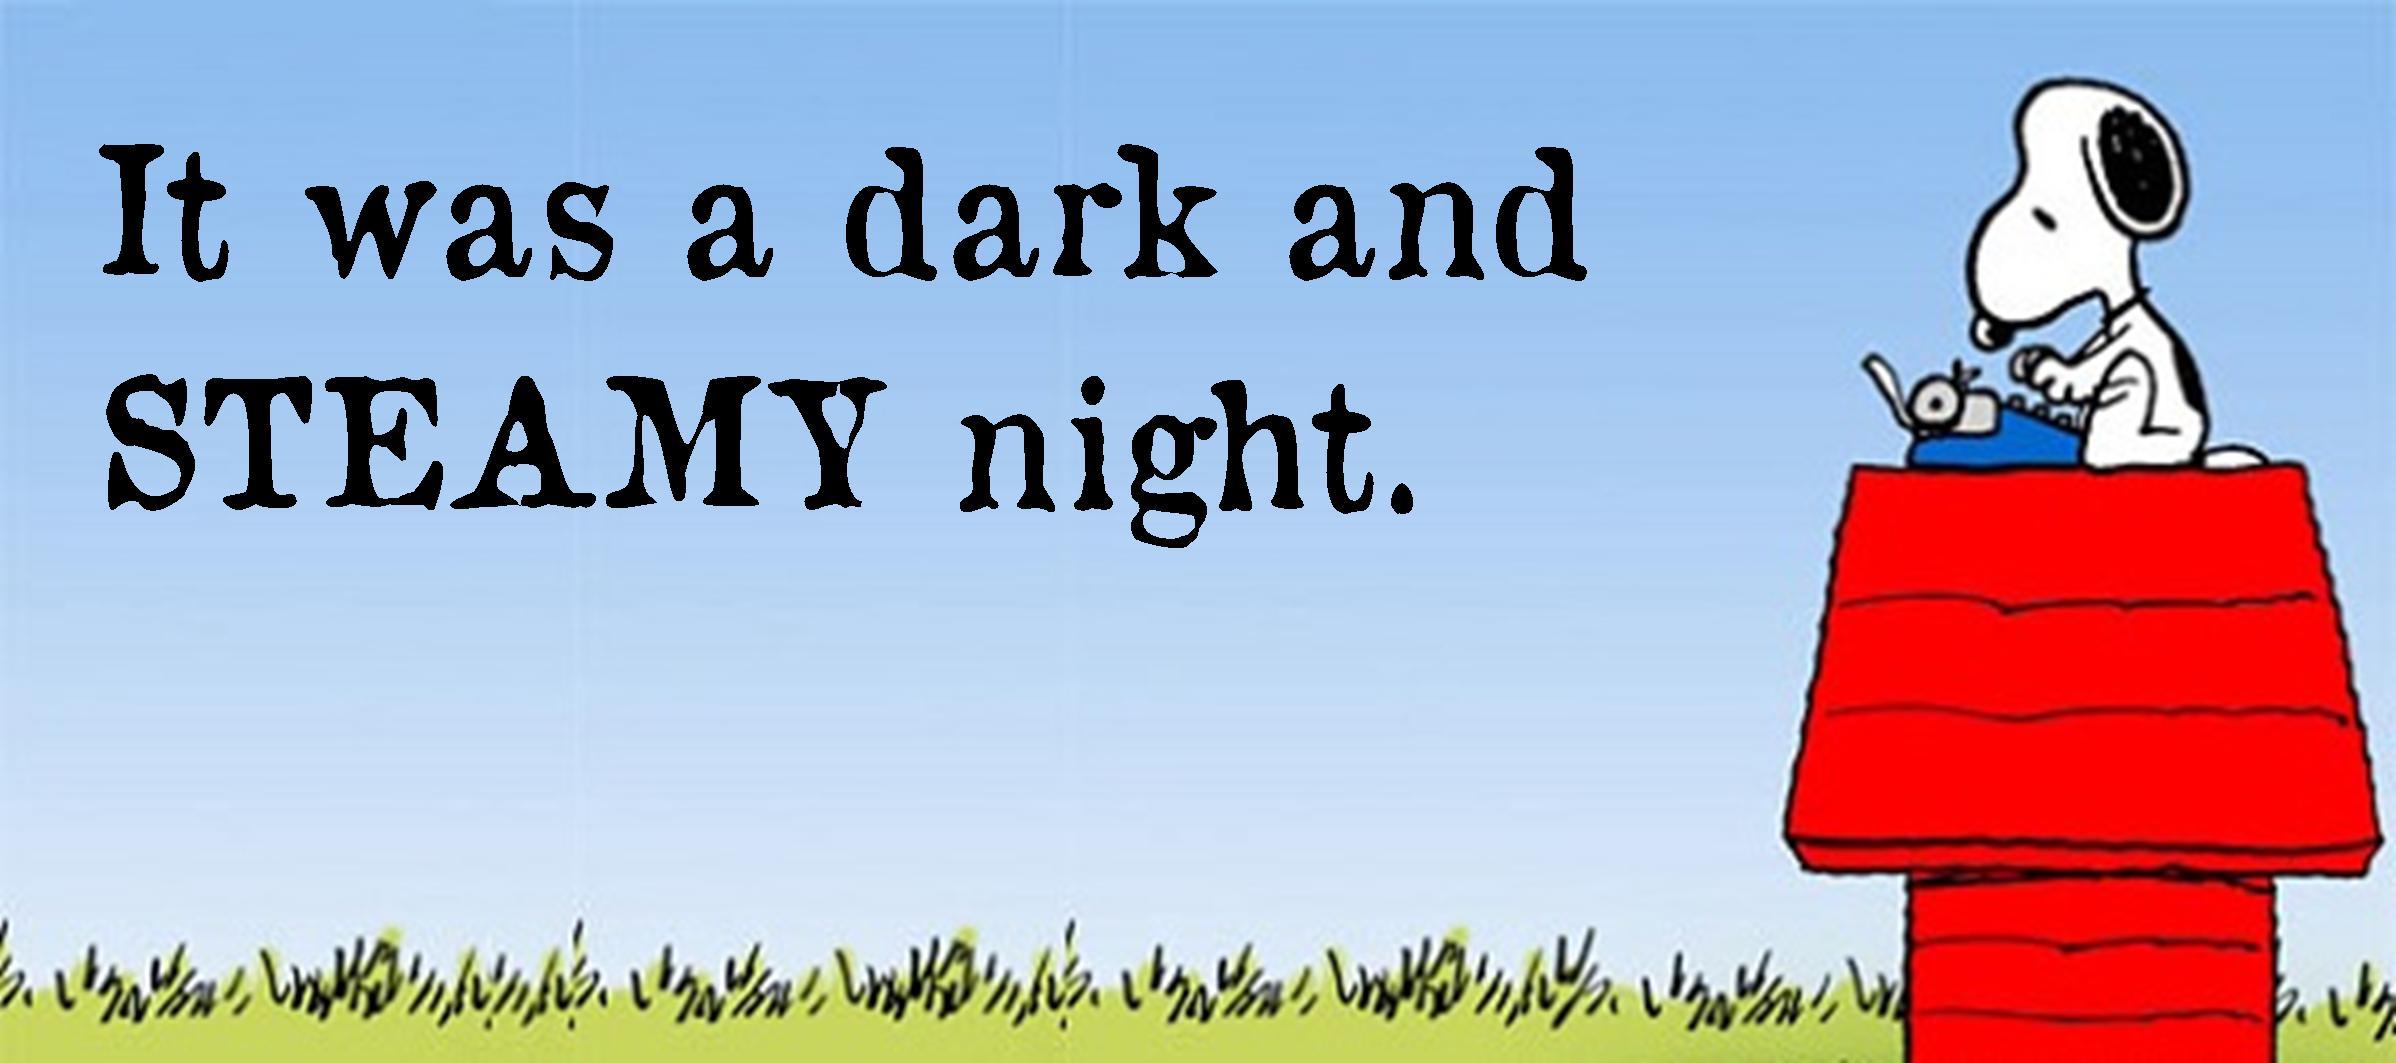 snoopy-dark-n-steamy-night.jpg